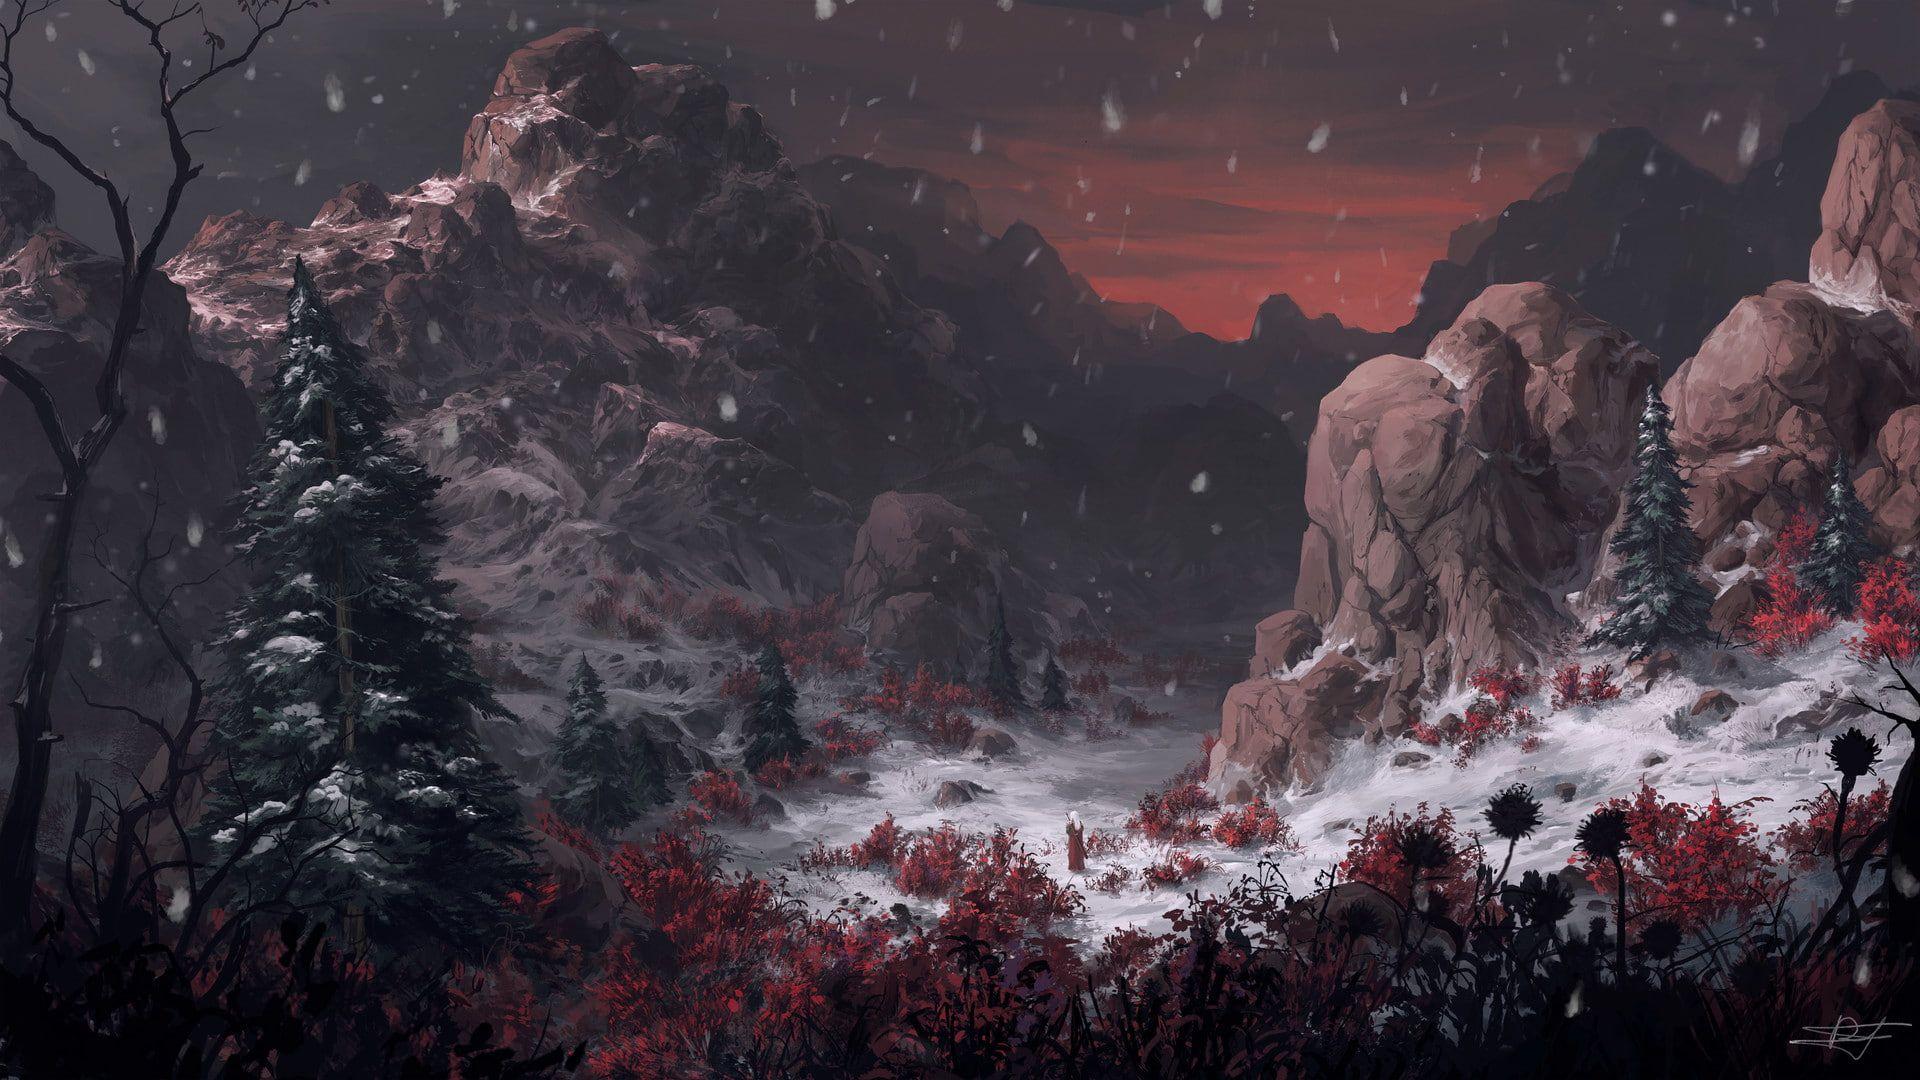 Landscape Mountains Artwork Digital Art Fantasy Art Winter Snow Rock Red 1080p Wallpaper Hdwallpaper Fantasy Landscape Digital Art Fantasy Landscape